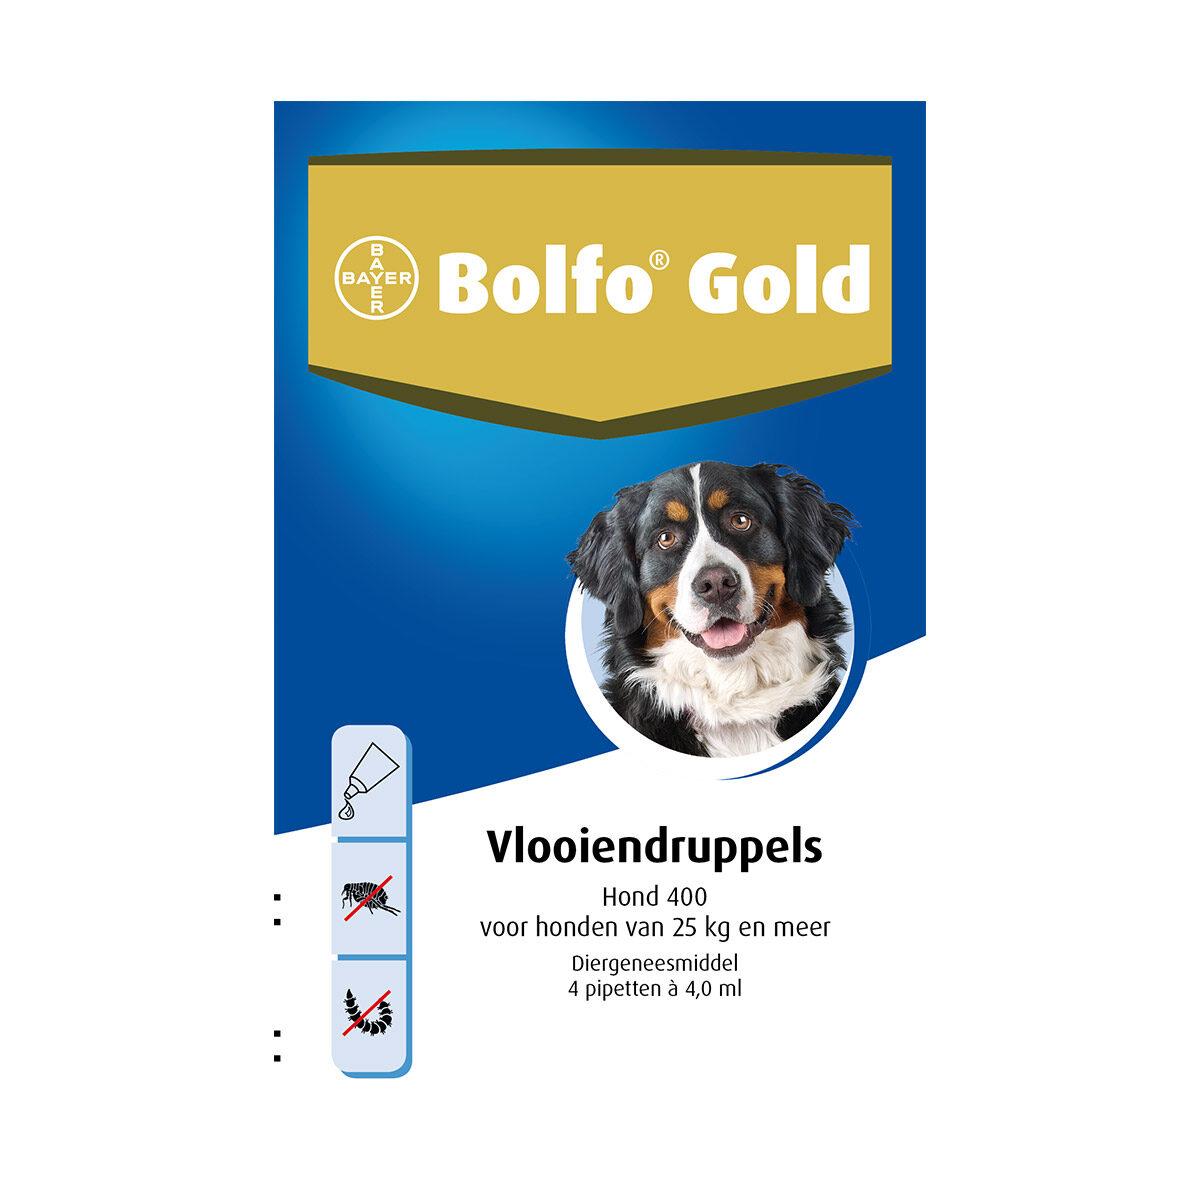 Bolfo Gold Hond 400 Vlooiendruppels 25 tot 40 kg 4 Pipetten